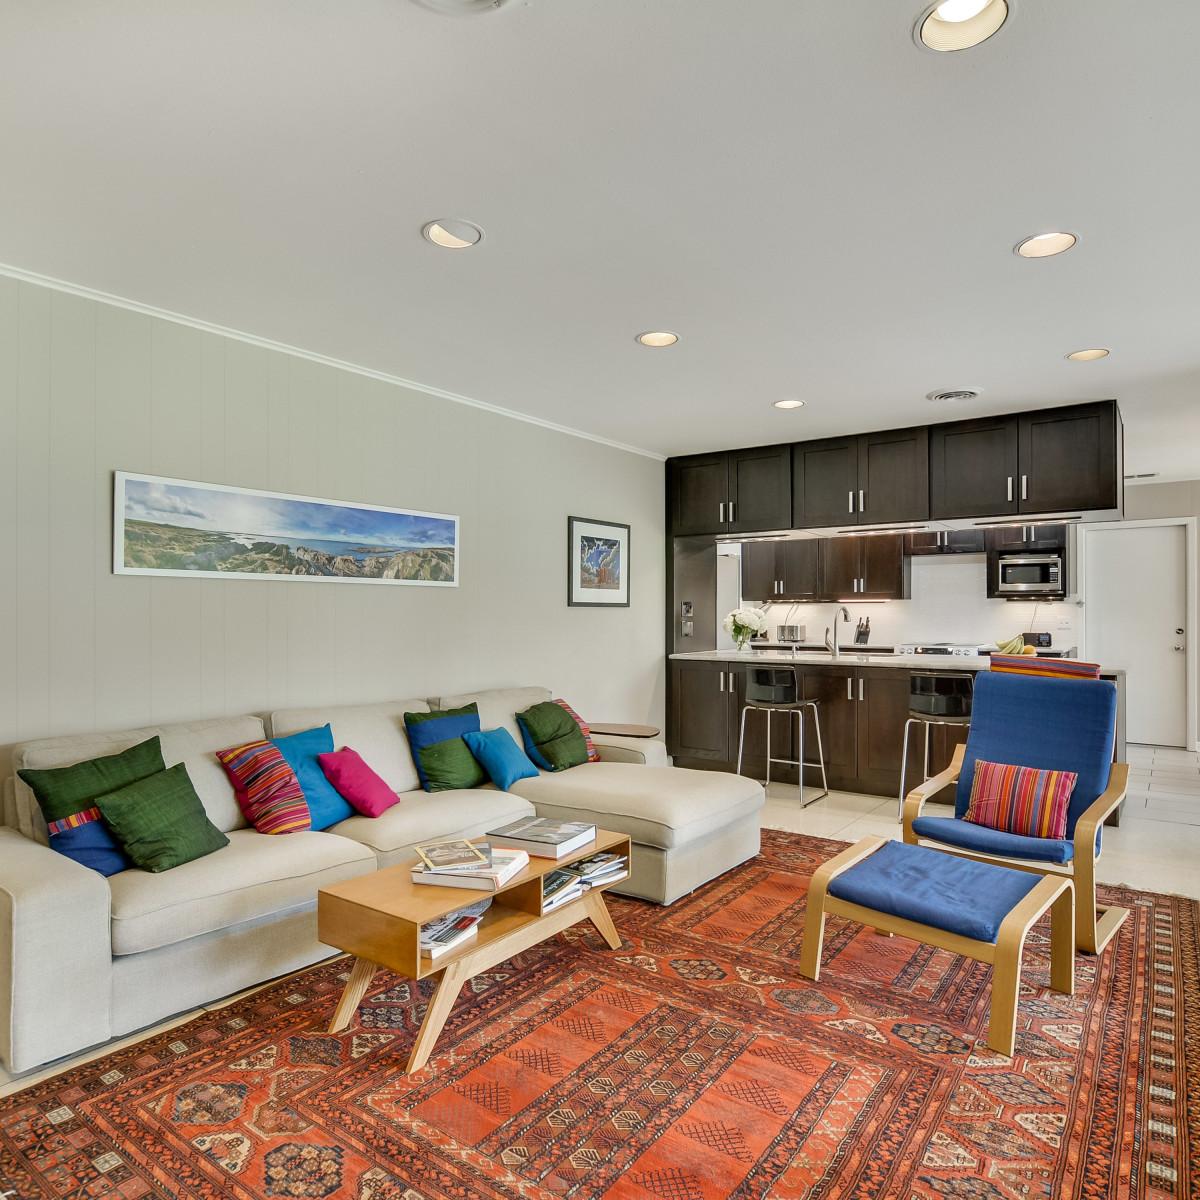 231 Hillview San Antonio house for sale